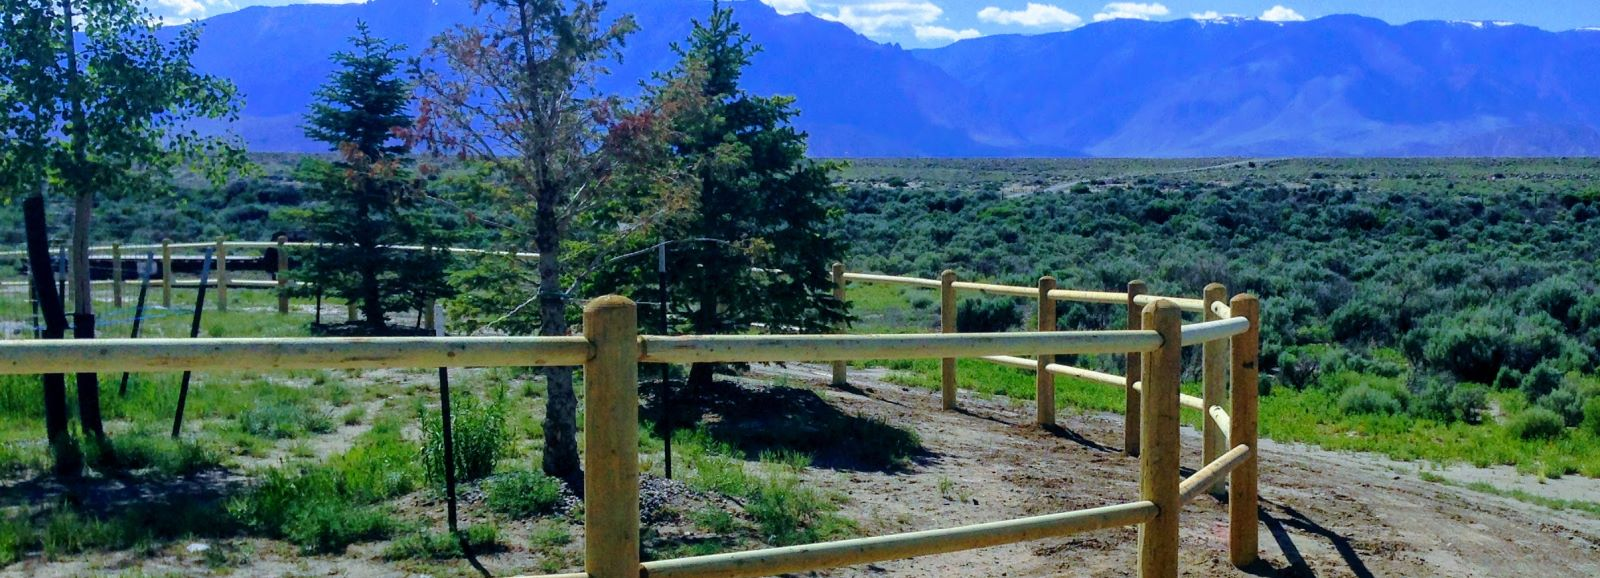 Wyoming Fence Company Near Me